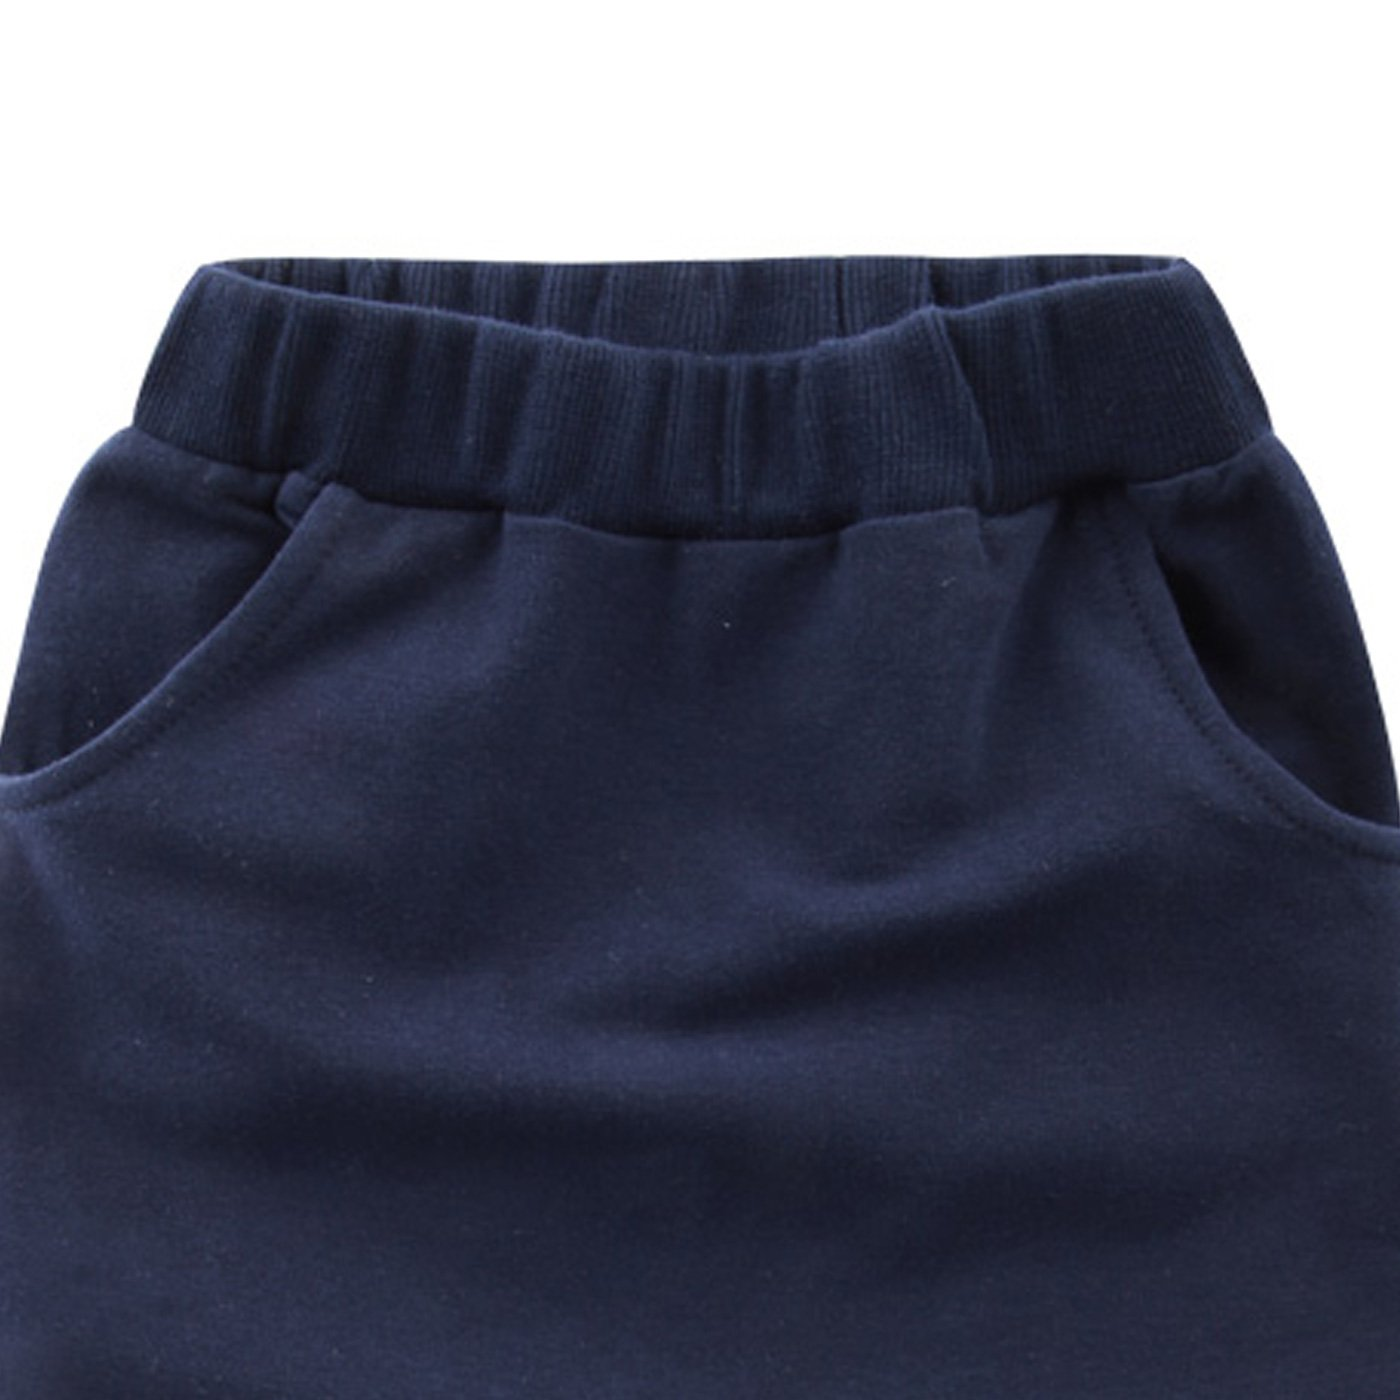 Happy cherry Pantalones Largos de Algod/ón para Ni/ños Beb/és Pantal/ón Deportivo Suave Pants Joggers Talla 12-18meses 18-24meses 24-36meses 3-4a/ños 4-5a/ños 6-7a/ños Caf/é Verde Azul Gris